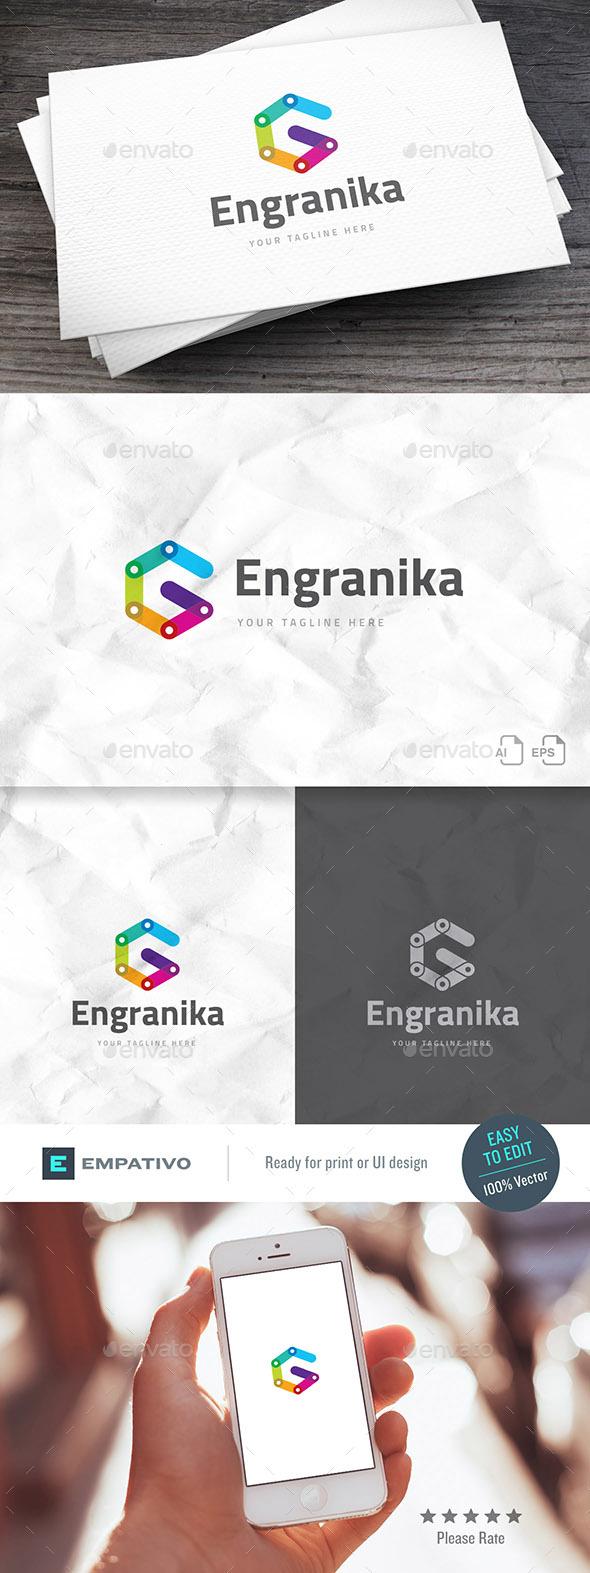 Engranika letter g logo template by empativo graphicriver engranika letter g logo template letters logo templates spiritdancerdesigns Choice Image